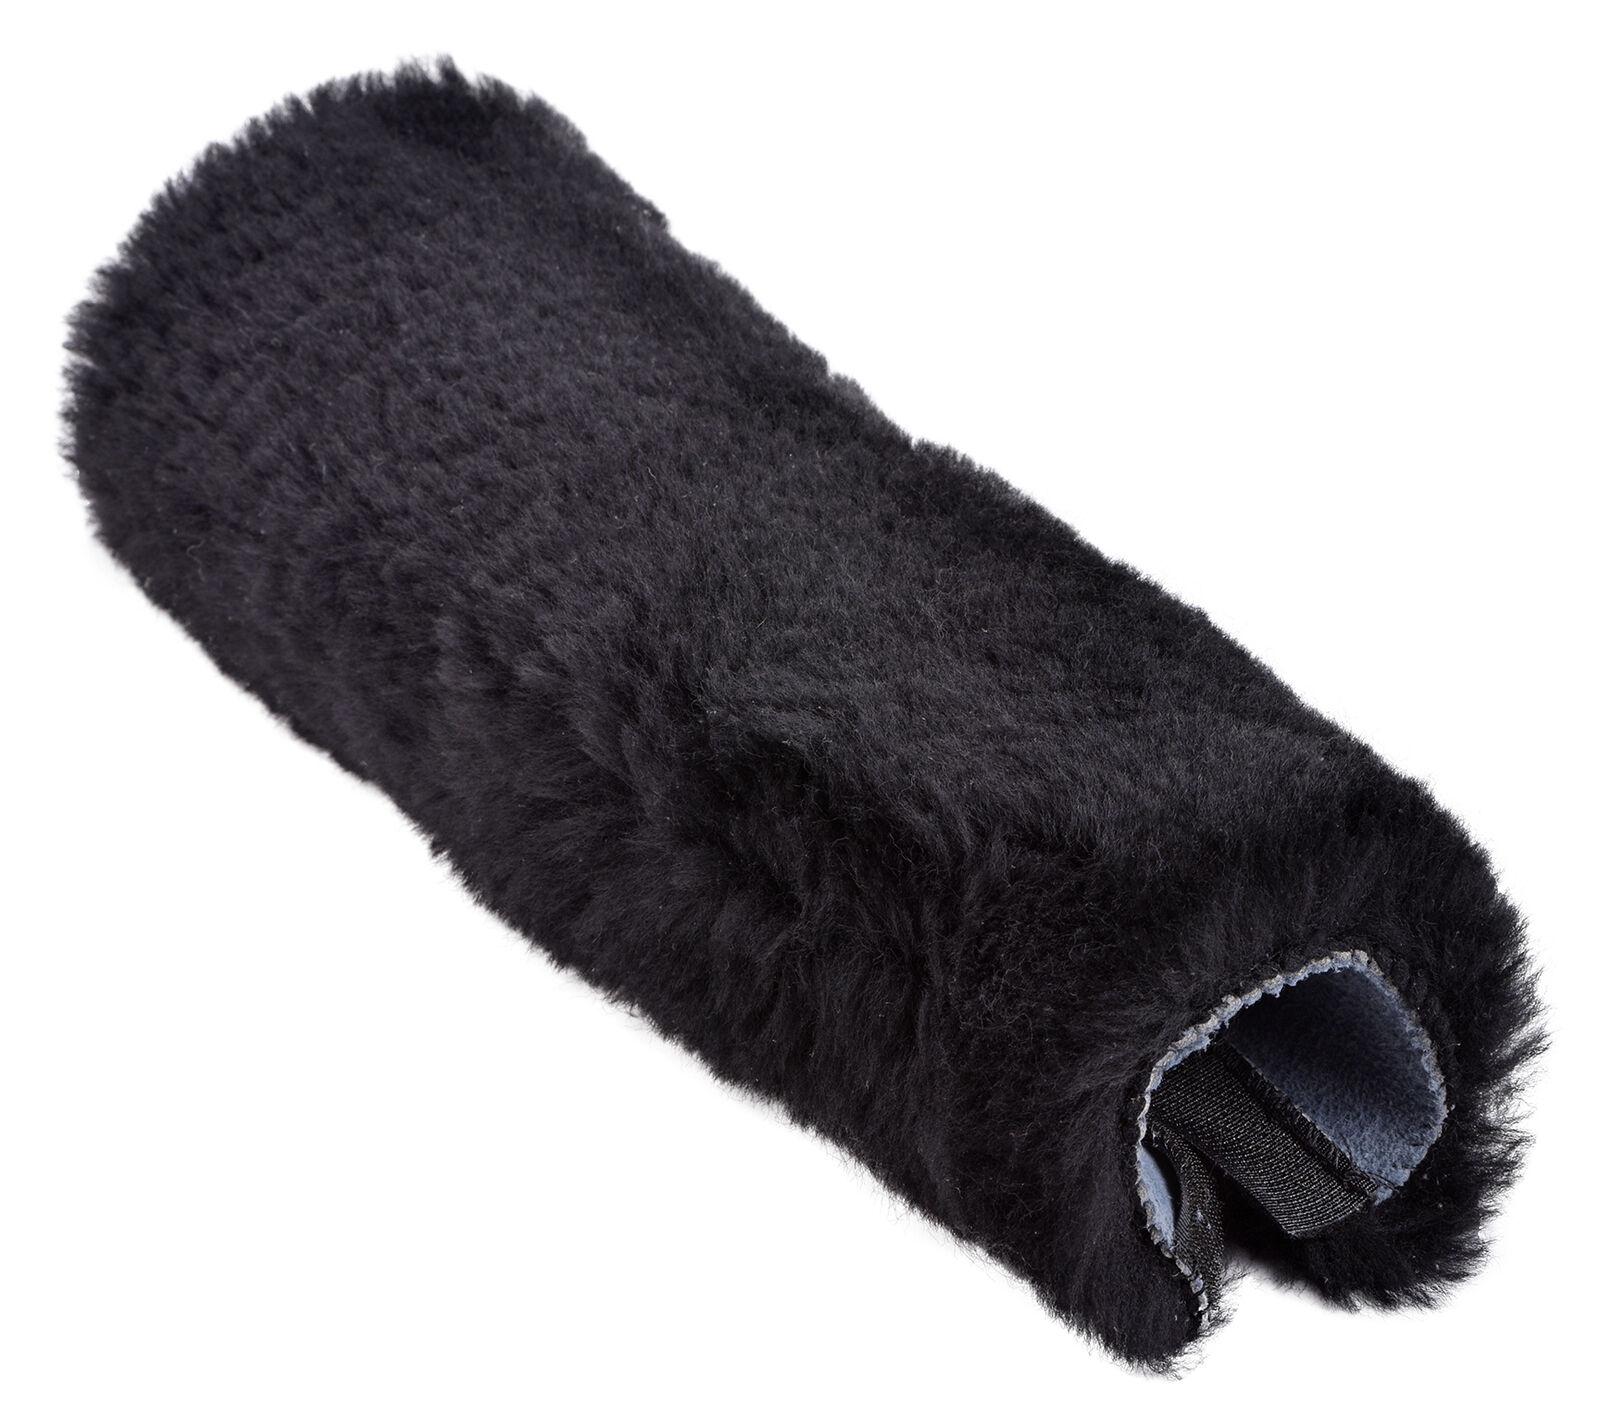 High Quality Genuine Sheepskin Seat Belt Cover Ripper Fastening Black Grey Pink